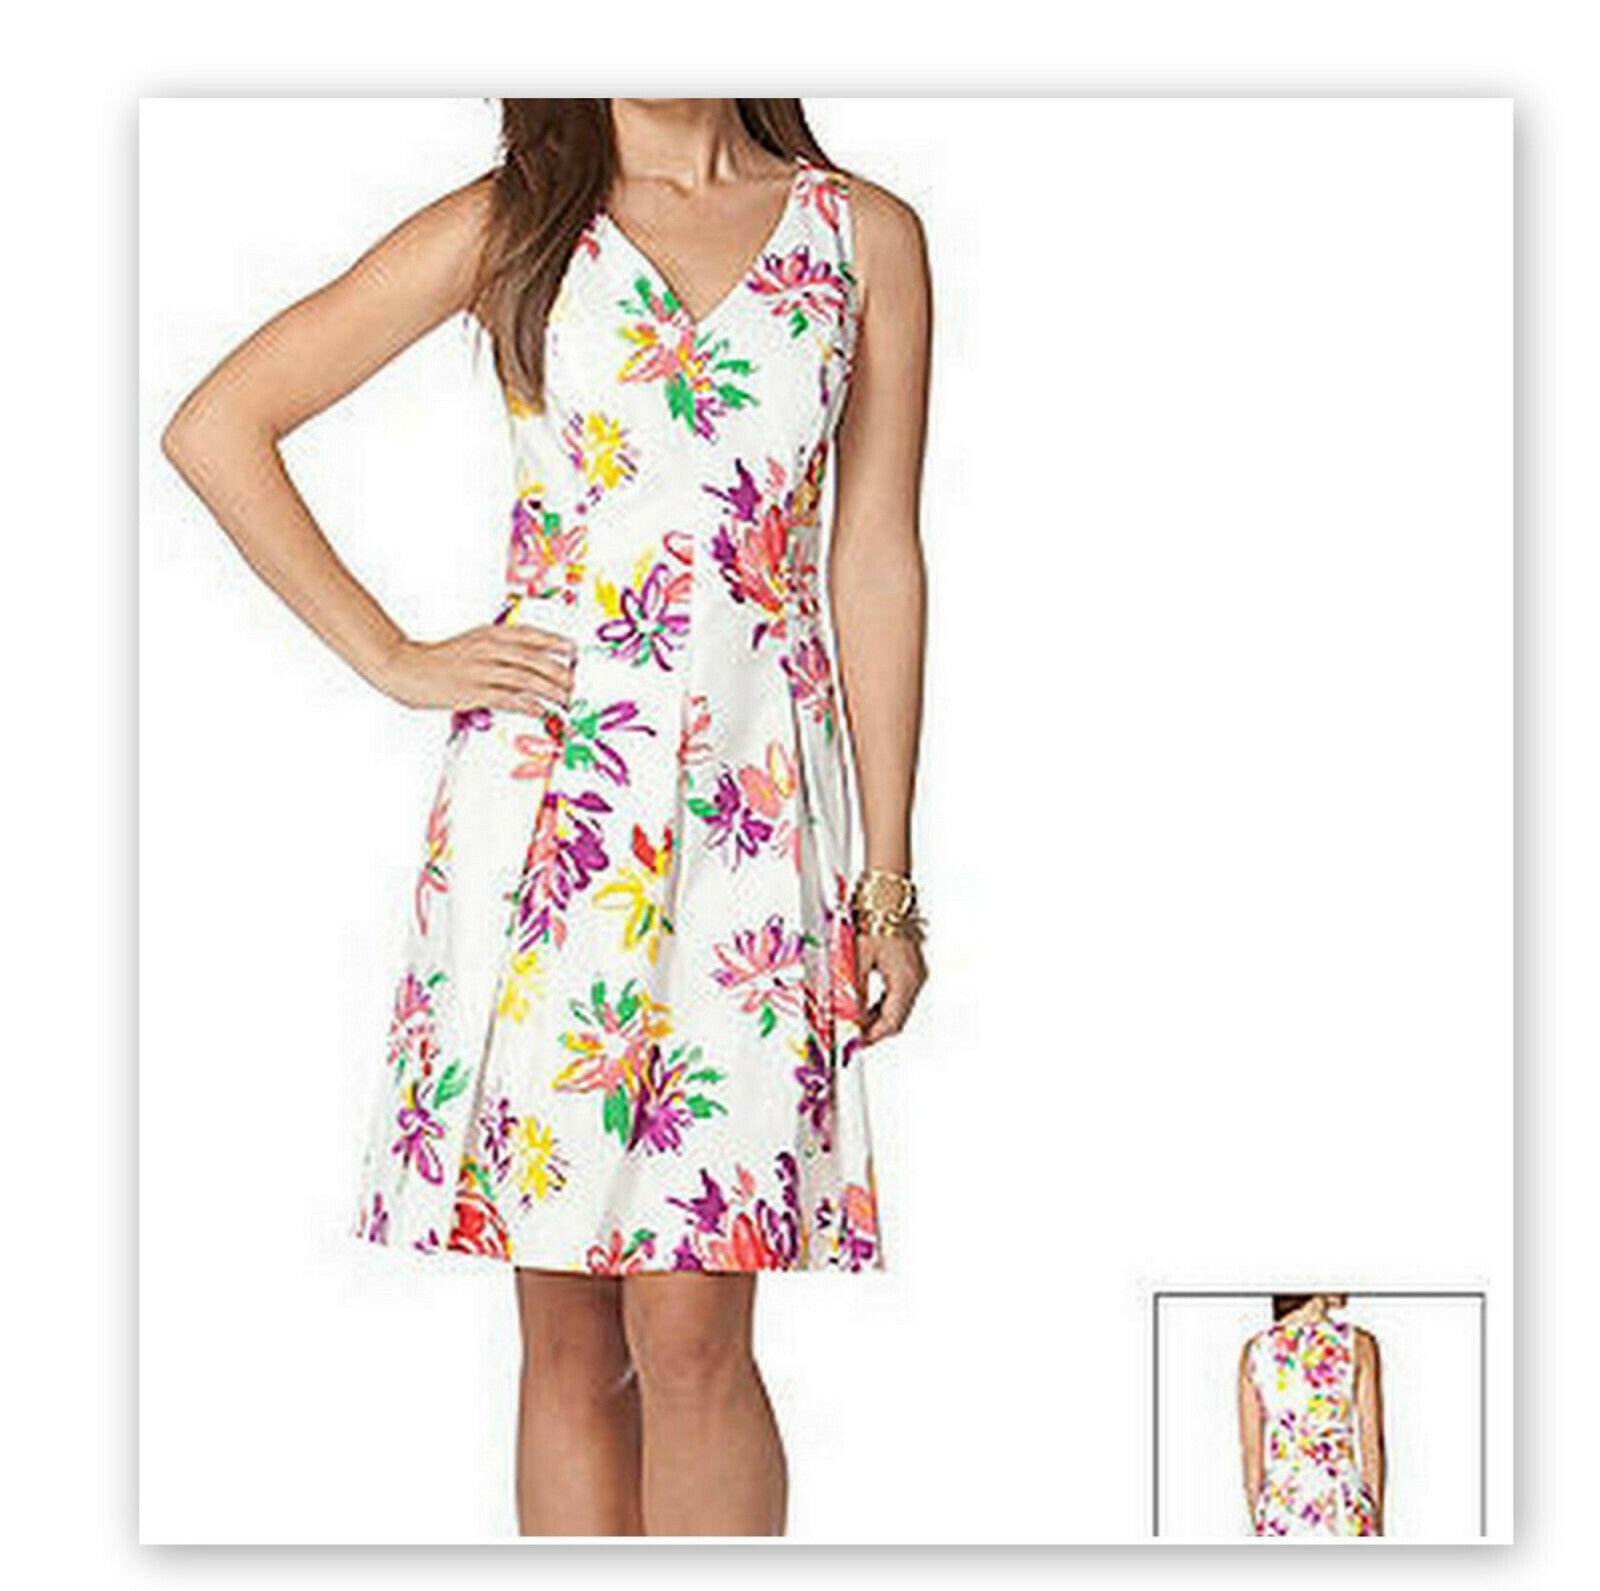 Ralph Lauren Chaps Dress Größe 12 Weiß Rosa Fit Floral Cotton